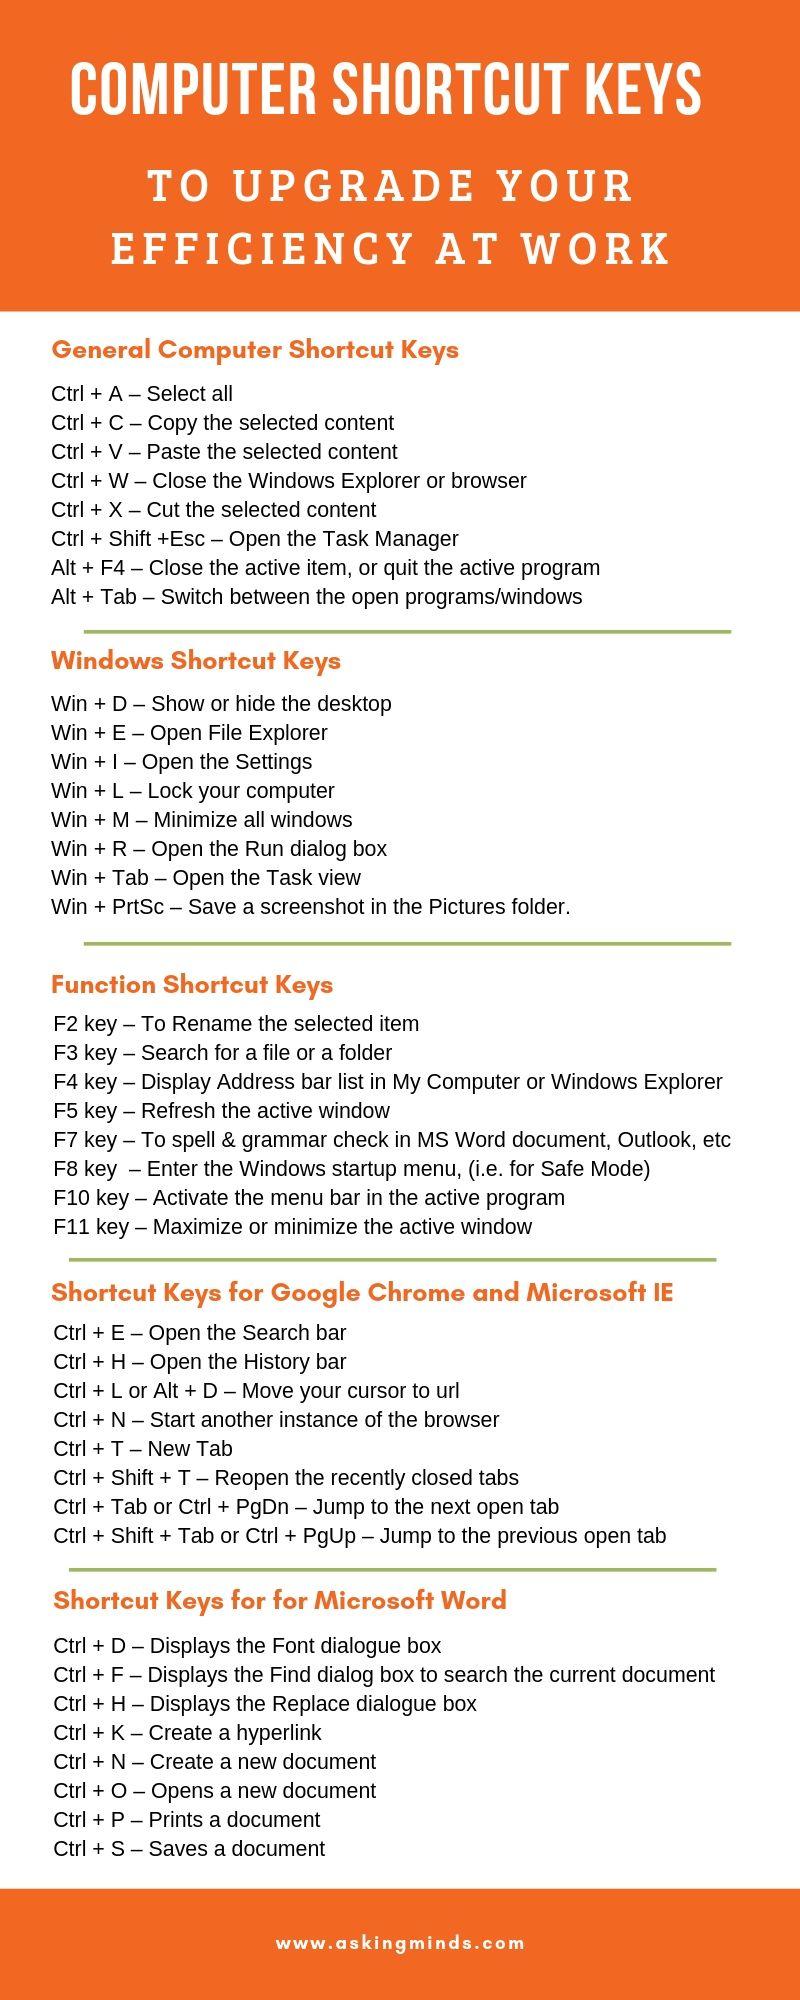 101 Computer Shortcut Keys To Upgrade Your Efficiency At Work Computer Shortcut Keys Computer Shortcuts Keyboard Shortcut Keys